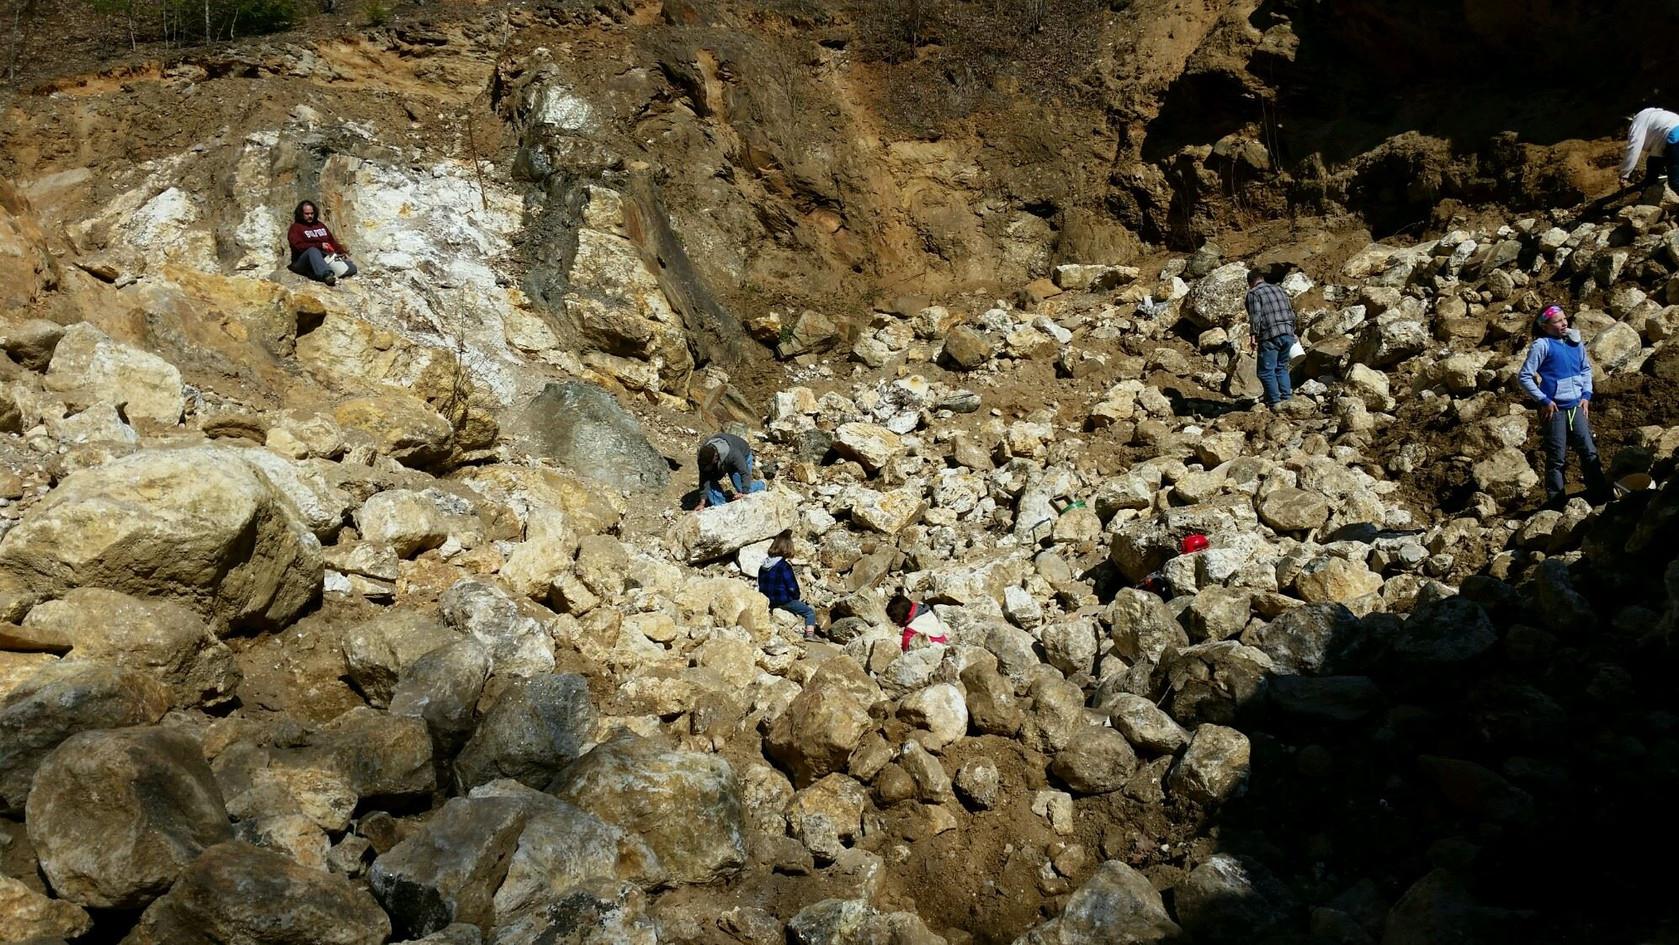 The Brushy Creek Mine